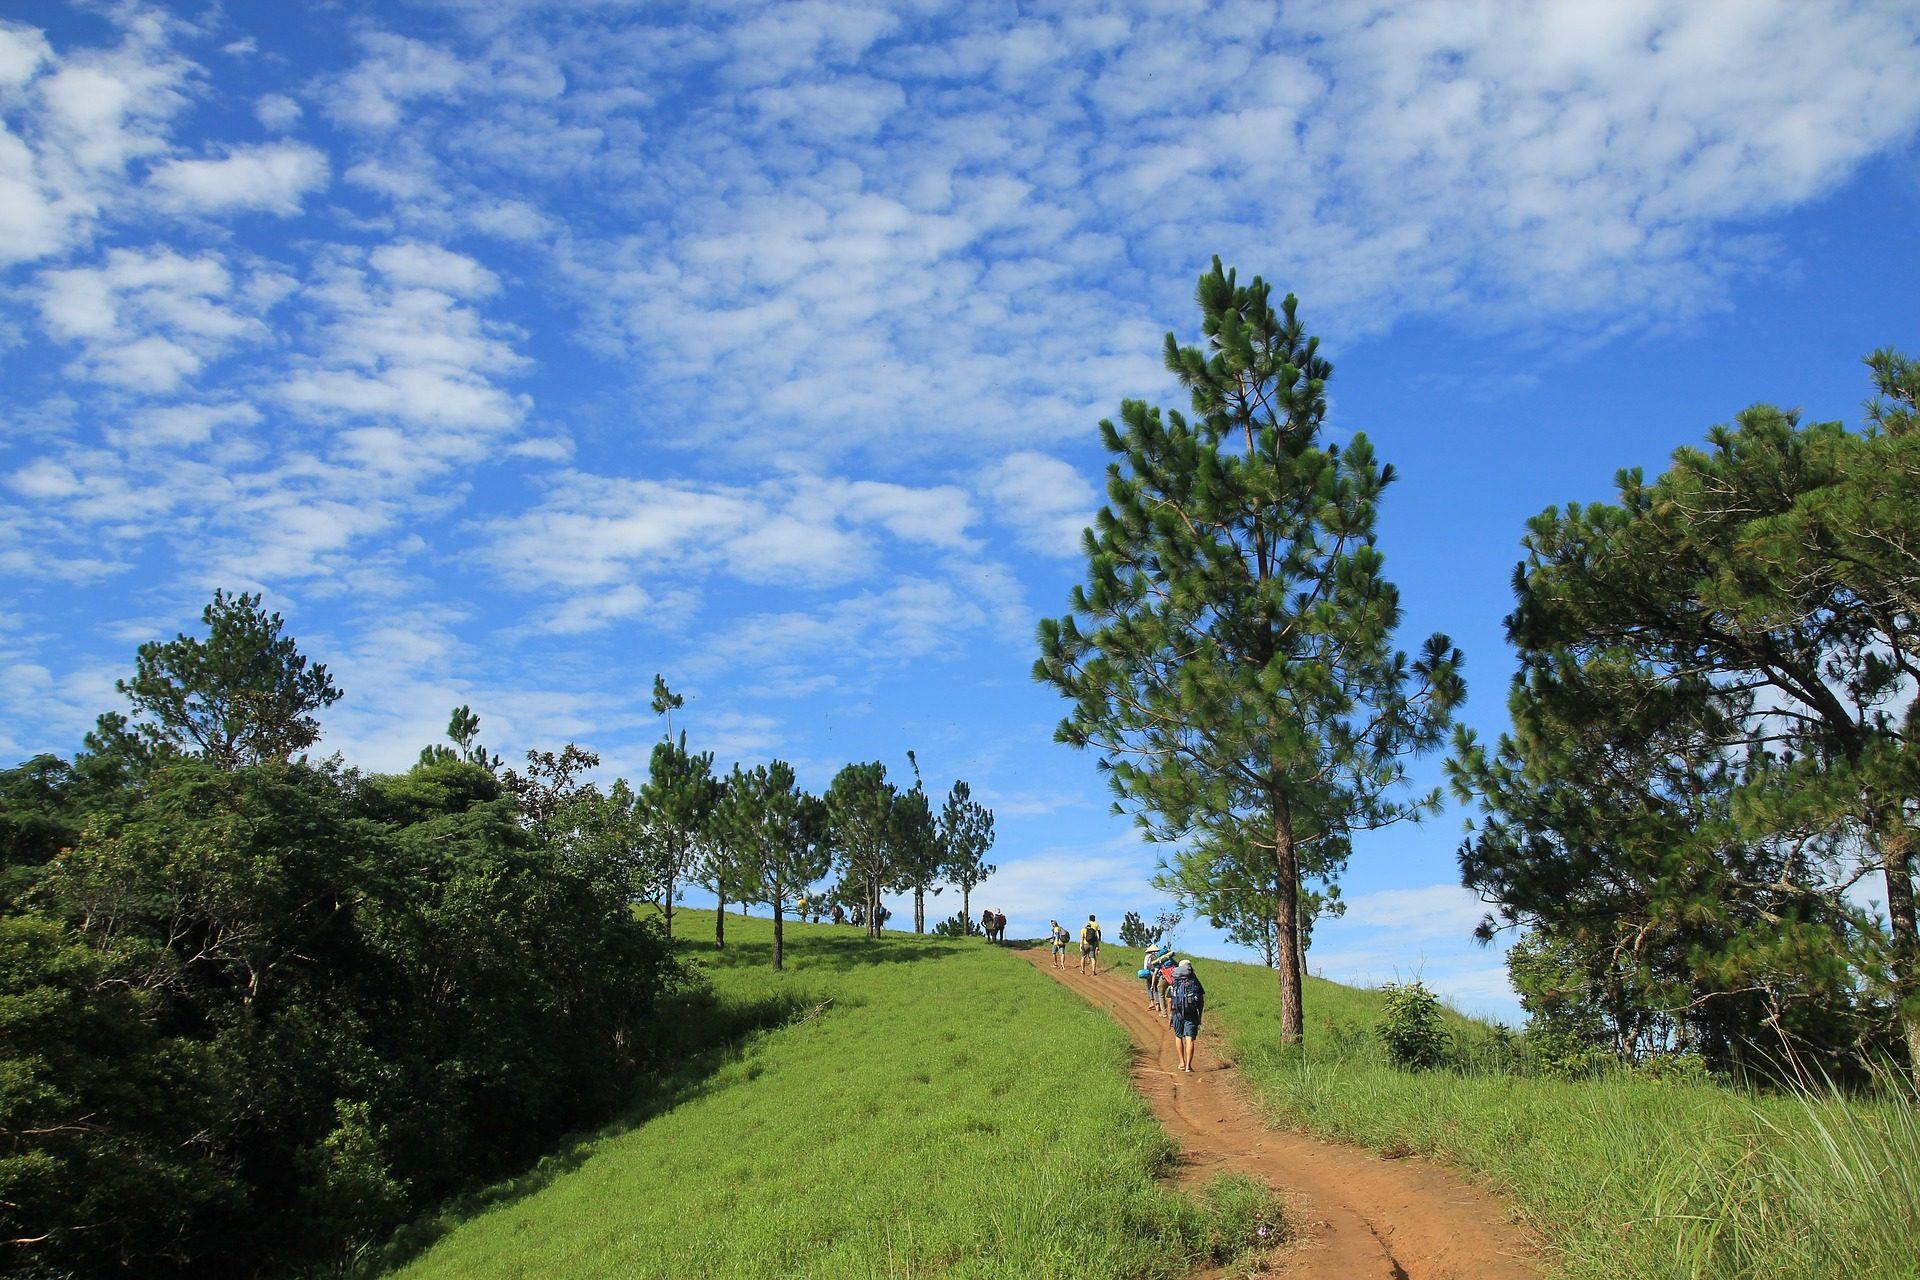 Vereda, Strada, vegetazione, camminatori, alberi, Cielo, nuvole - Sfondi HD - Professor-falken.com